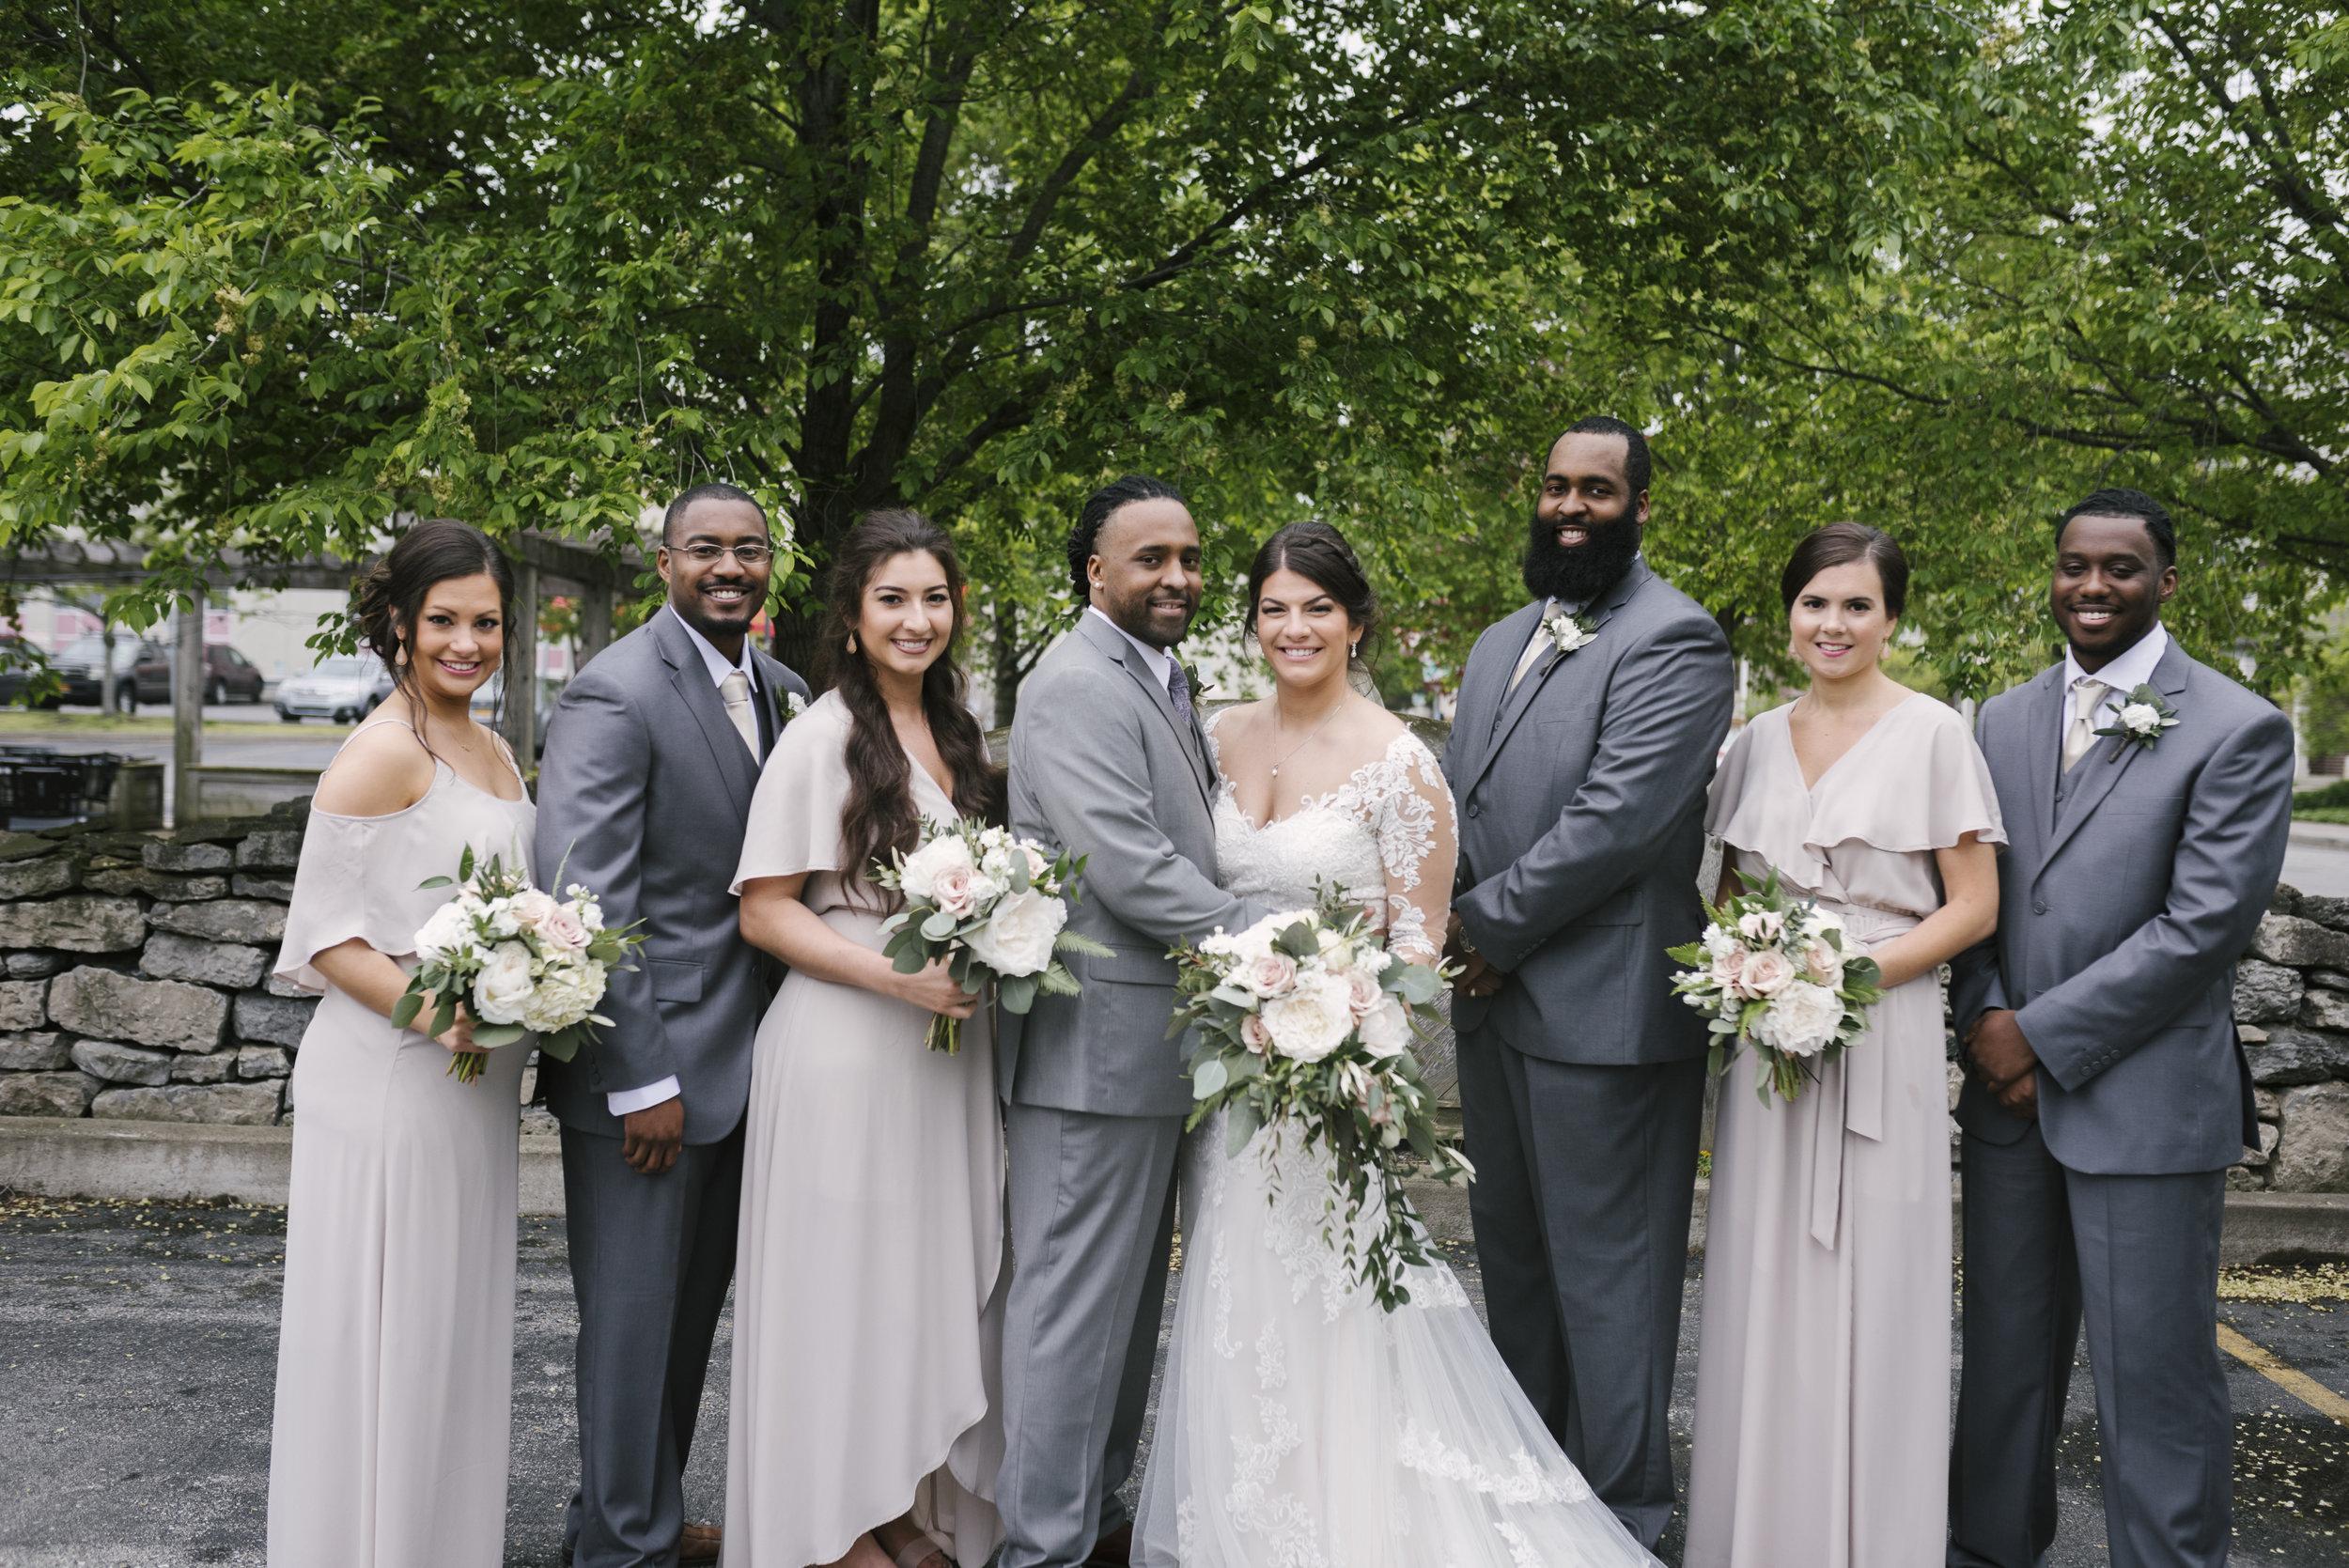 rochester-wedding-photographer-arbor-loft-22.jpg